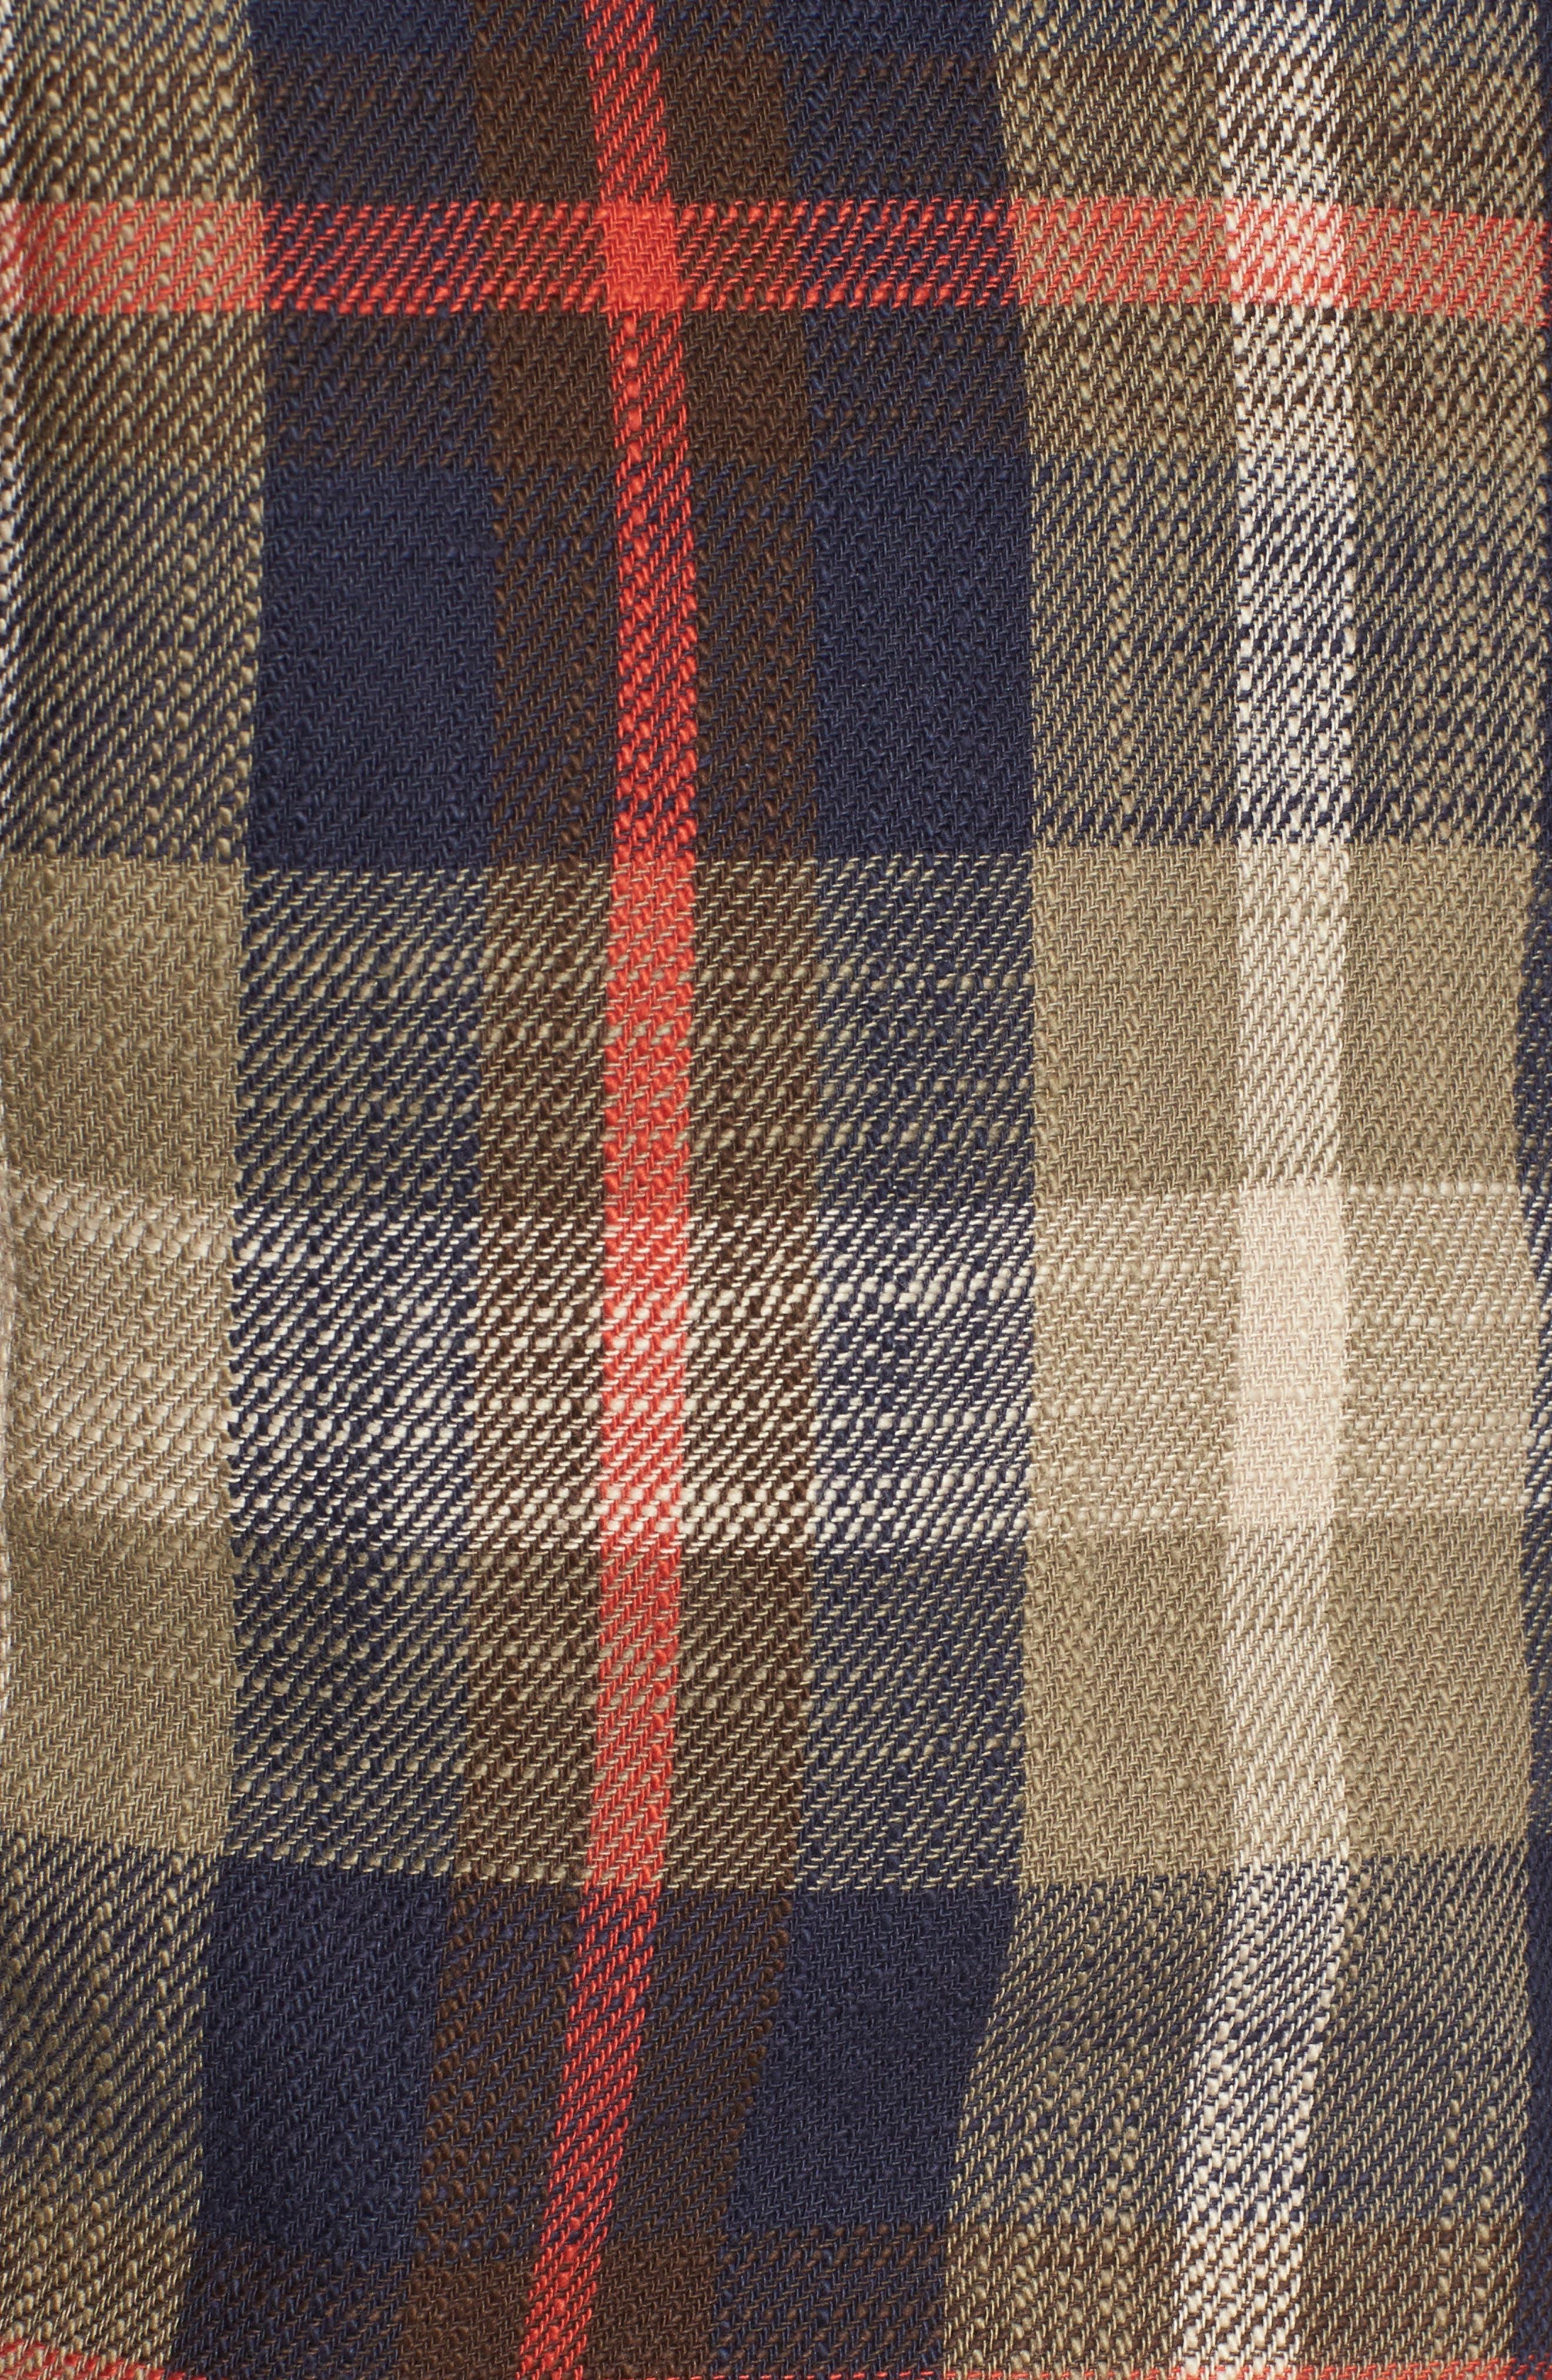 Brae Plaid Flannel Shirt,                             Alternate thumbnail 5, color,